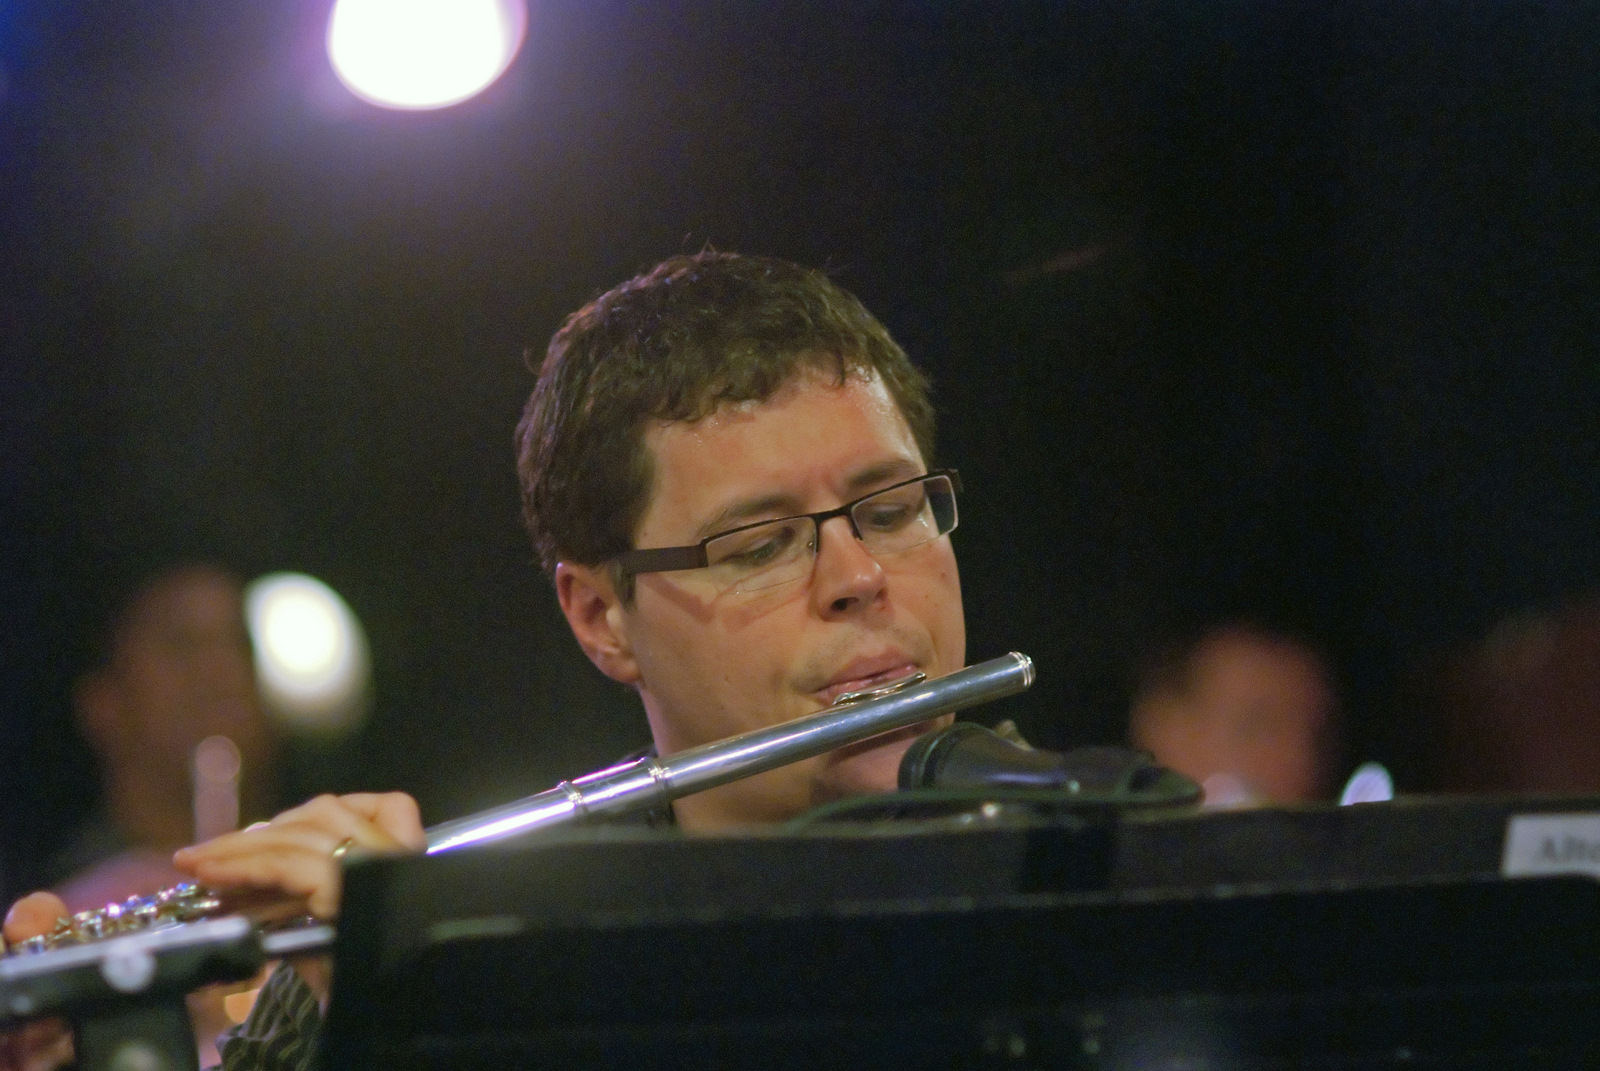 Todd Bashore